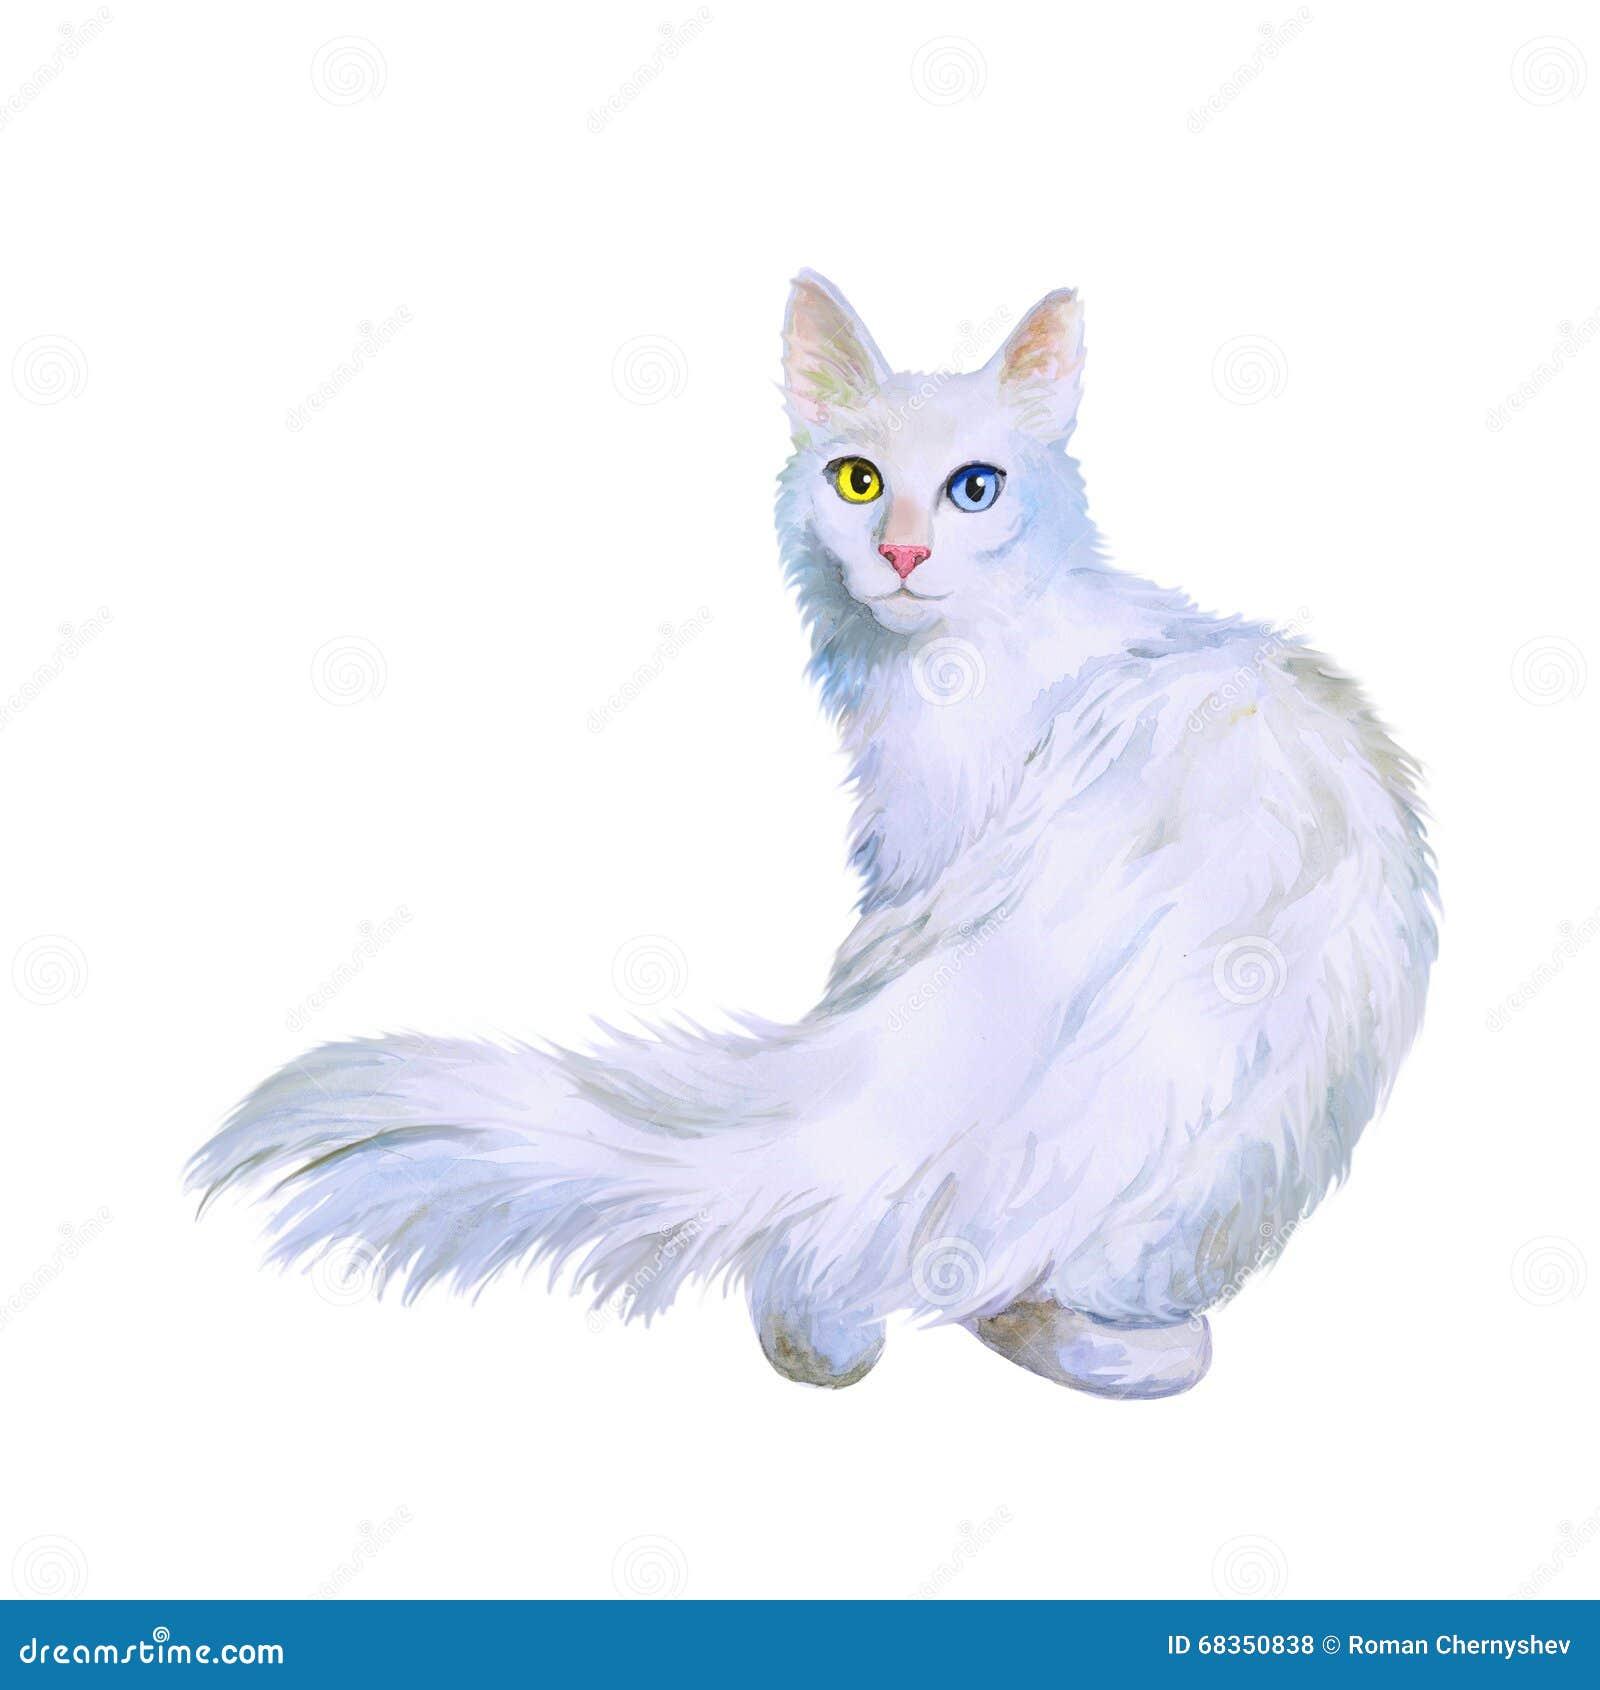 Angora cat claim